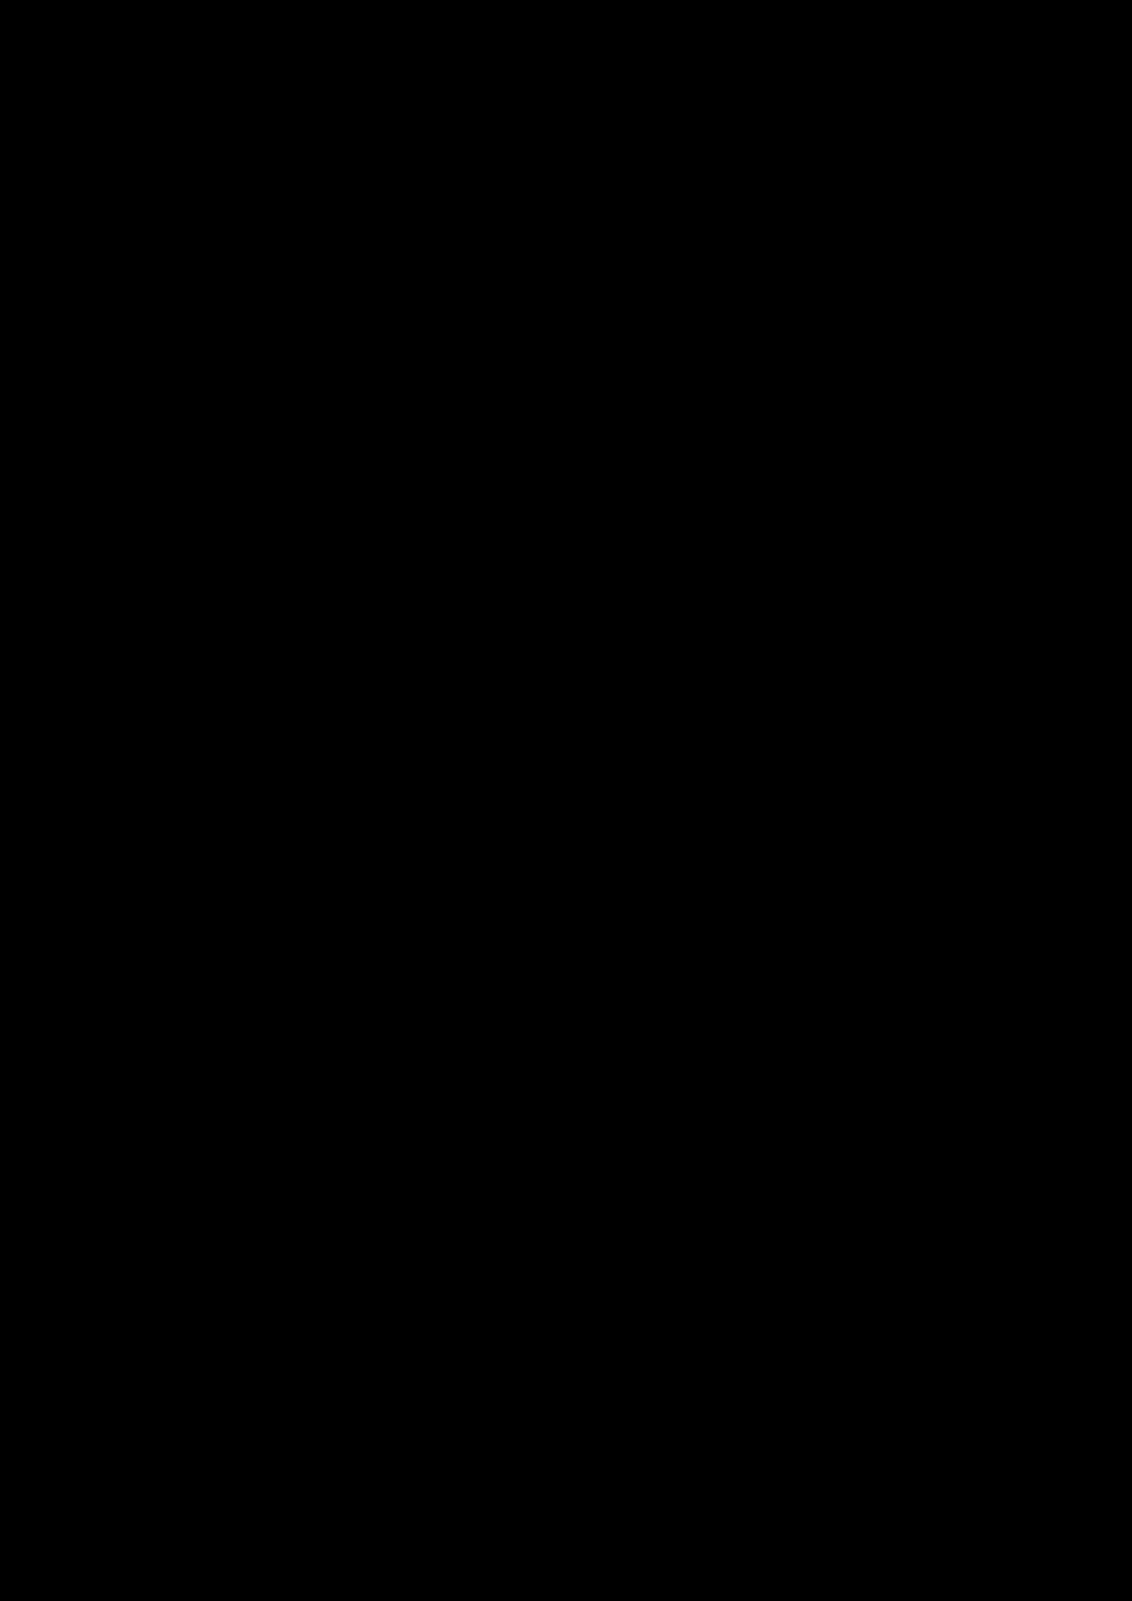 Deklassirovannyim elementam slide, Image 10